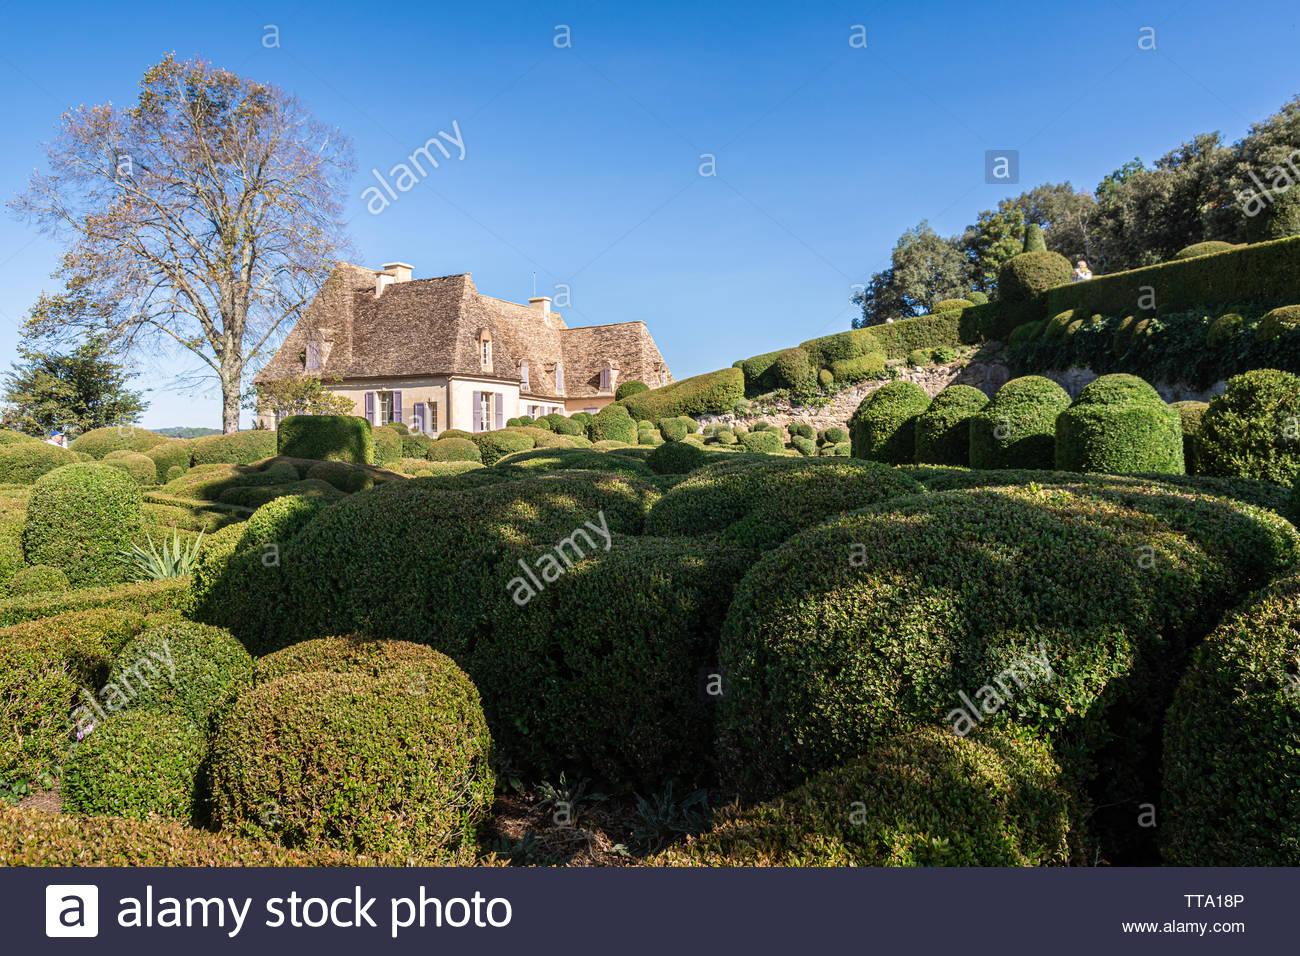 gardens of the chateau de marqueyssac in the historic perigord region of france TTA18P